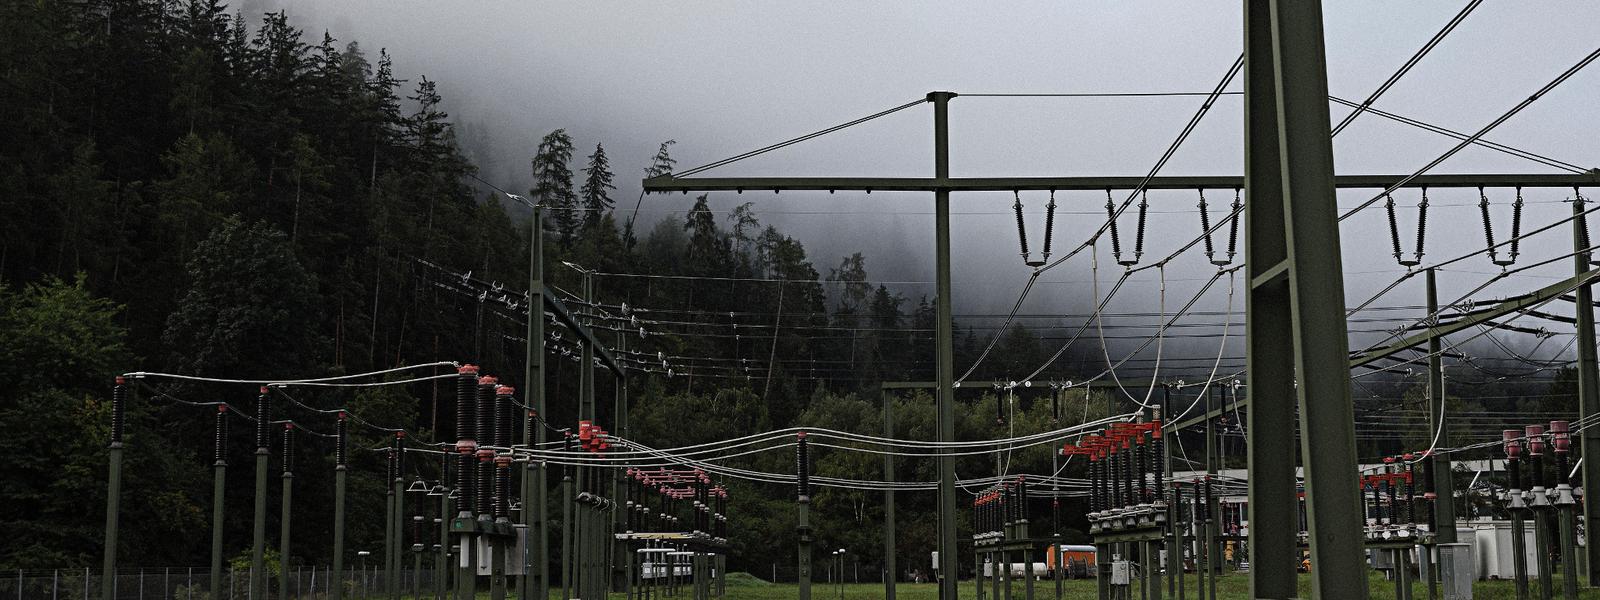 Transformer station in the Tyrol